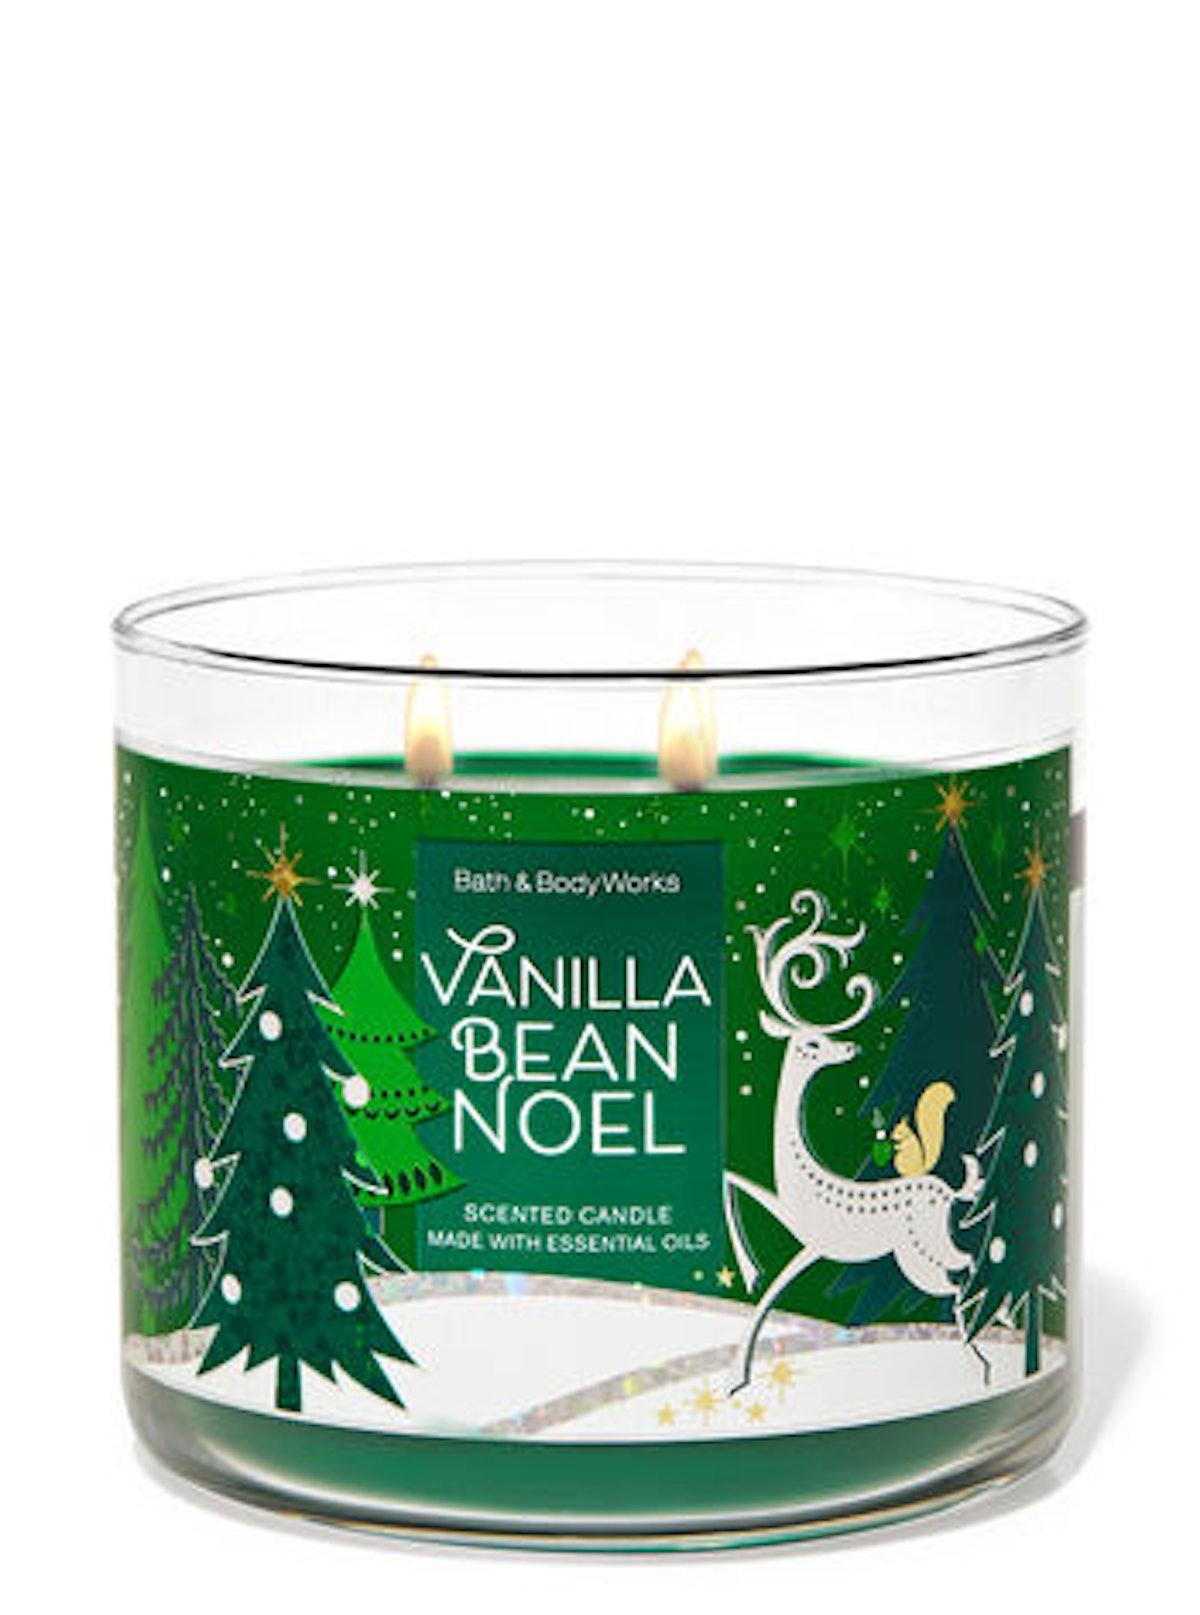 Vanilla Bean Noel Three-Wick Candle